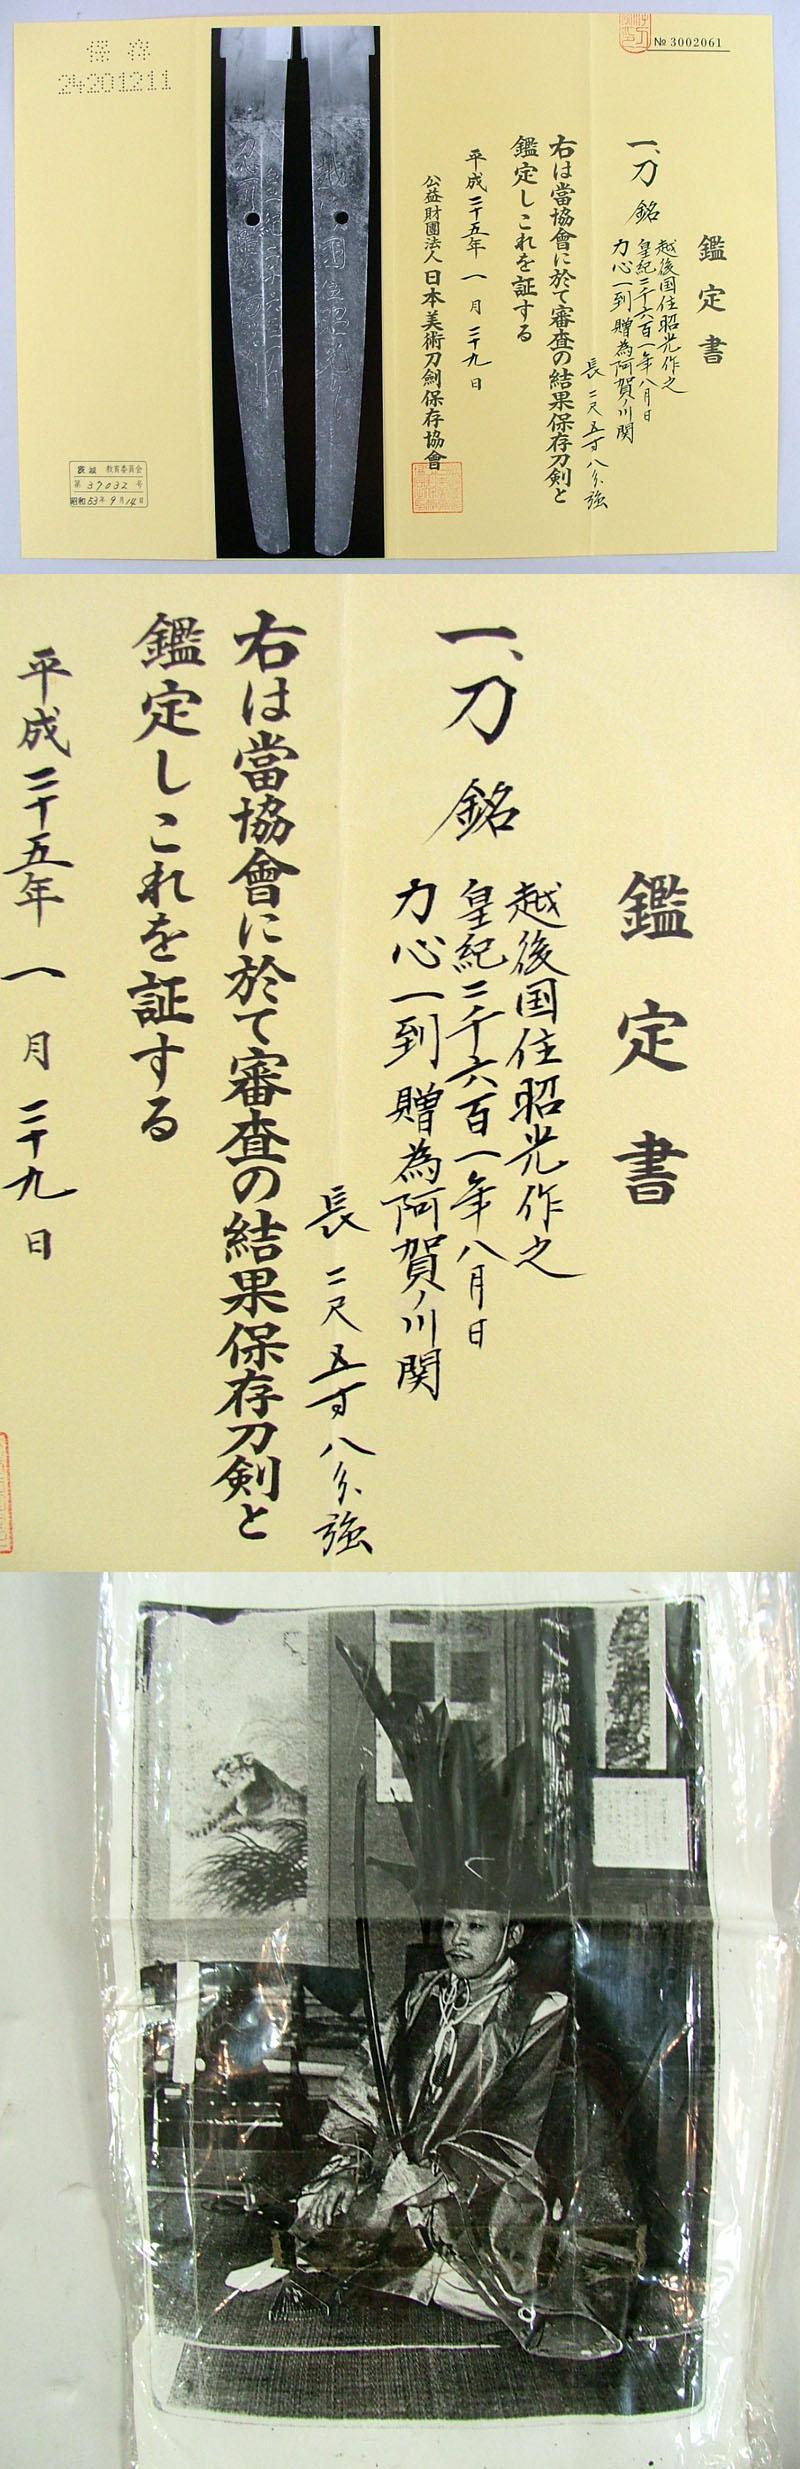 越後国住昭光作之 Picture of Certificate